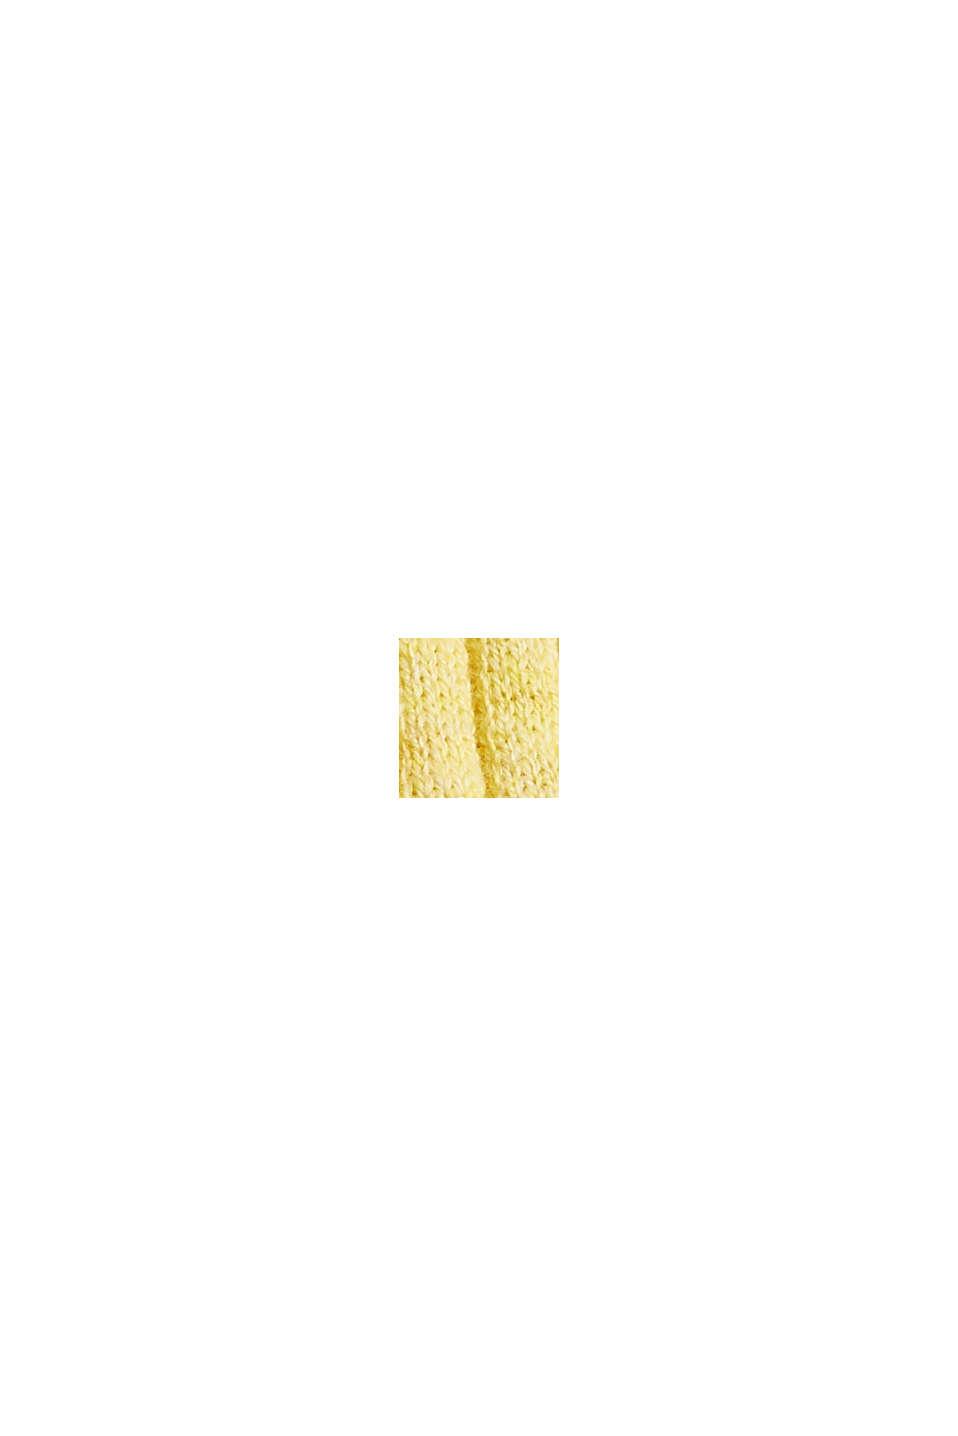 Rib knit sleeveless top, organic cotton, LIGHT YELLOW, swatch